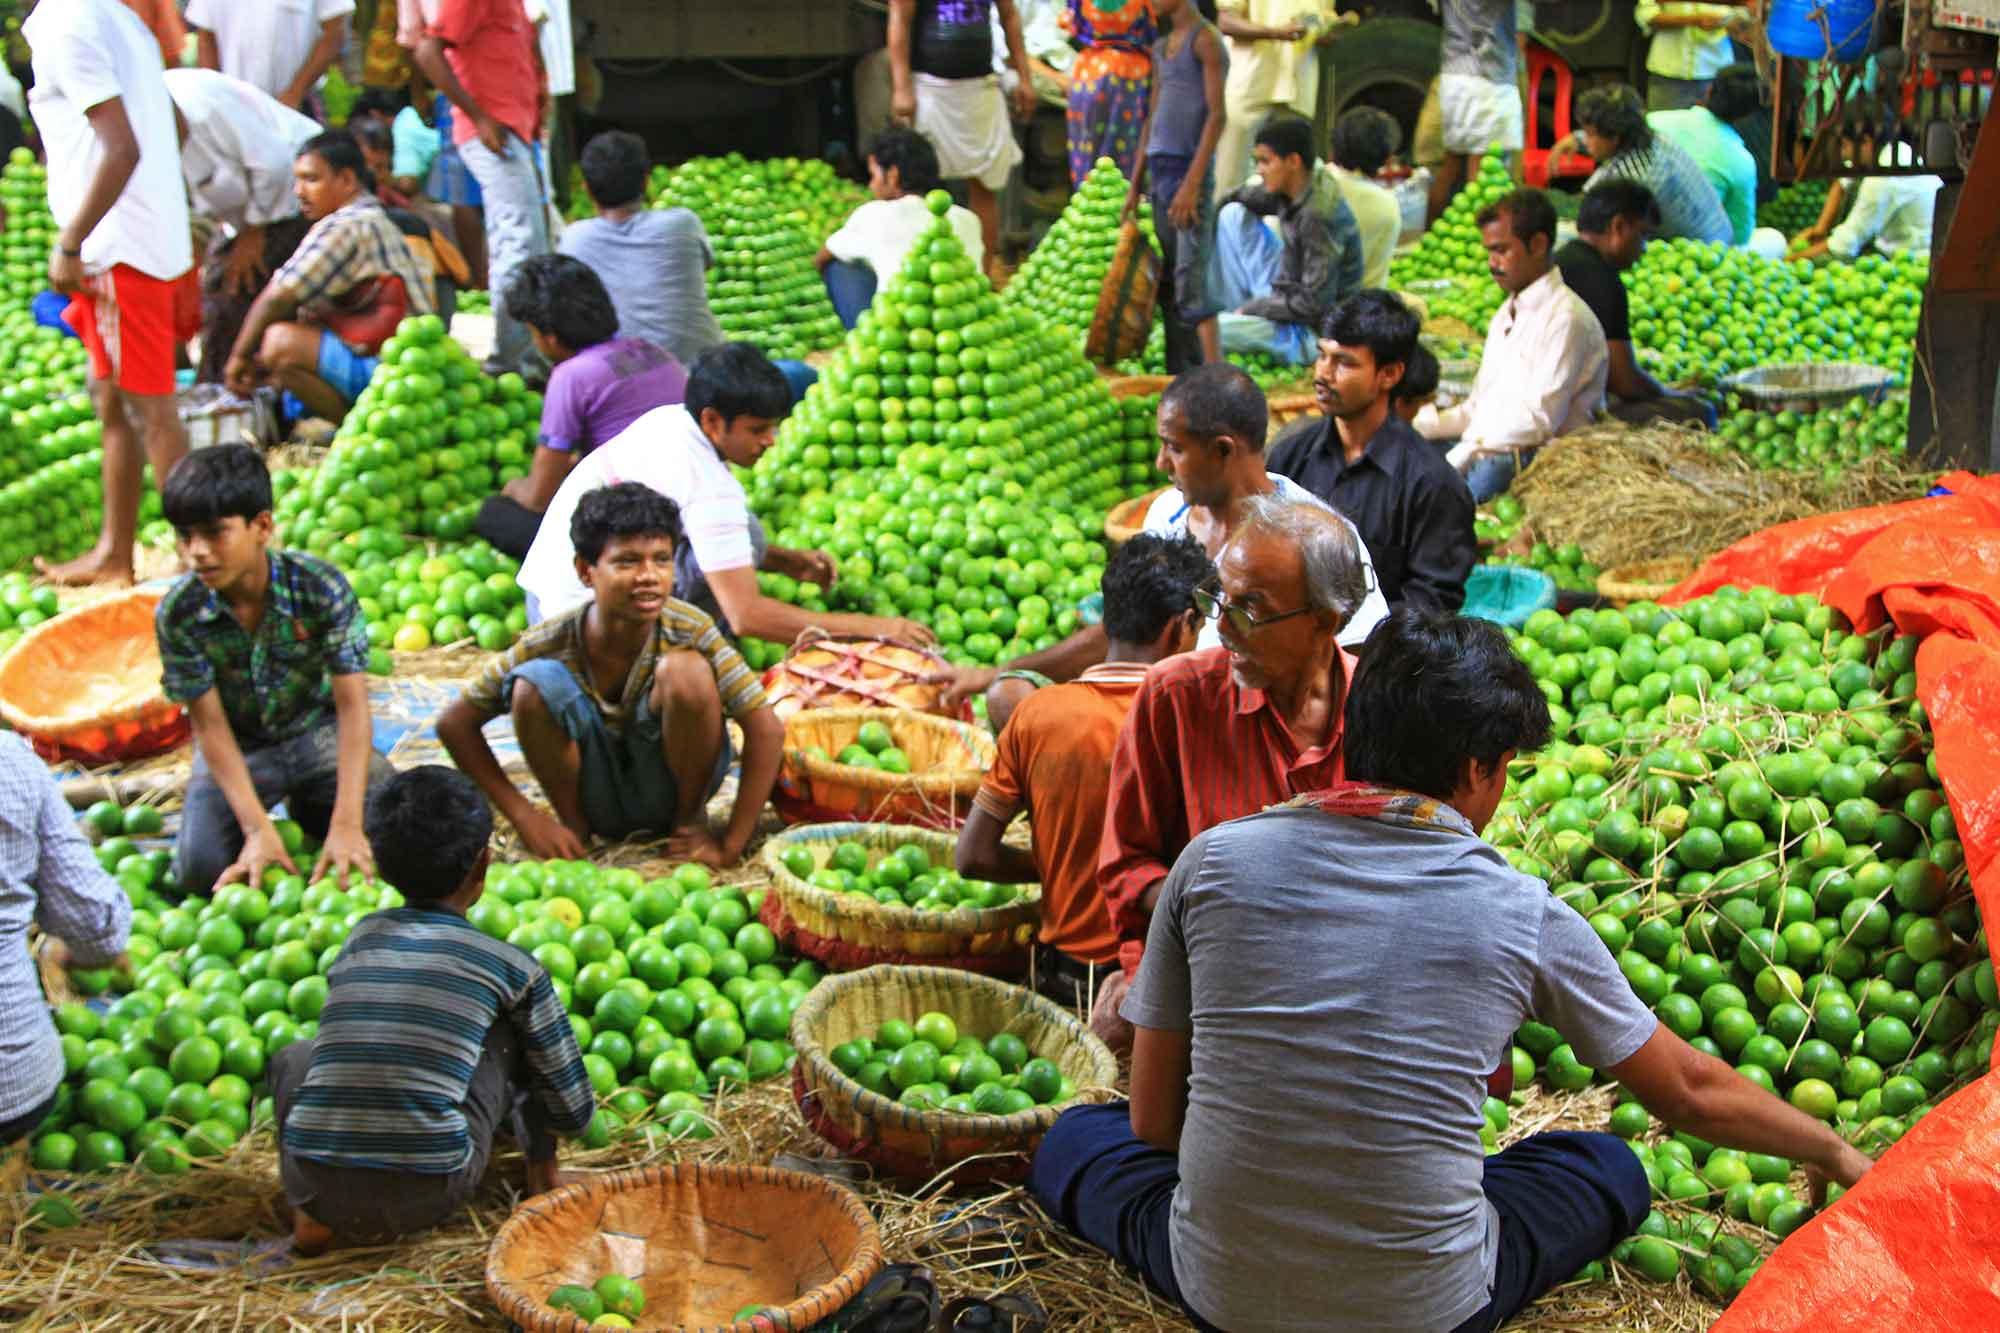 Wholesale fruit market in Kolkata, India. © Ulli Maier & Nisa Maier